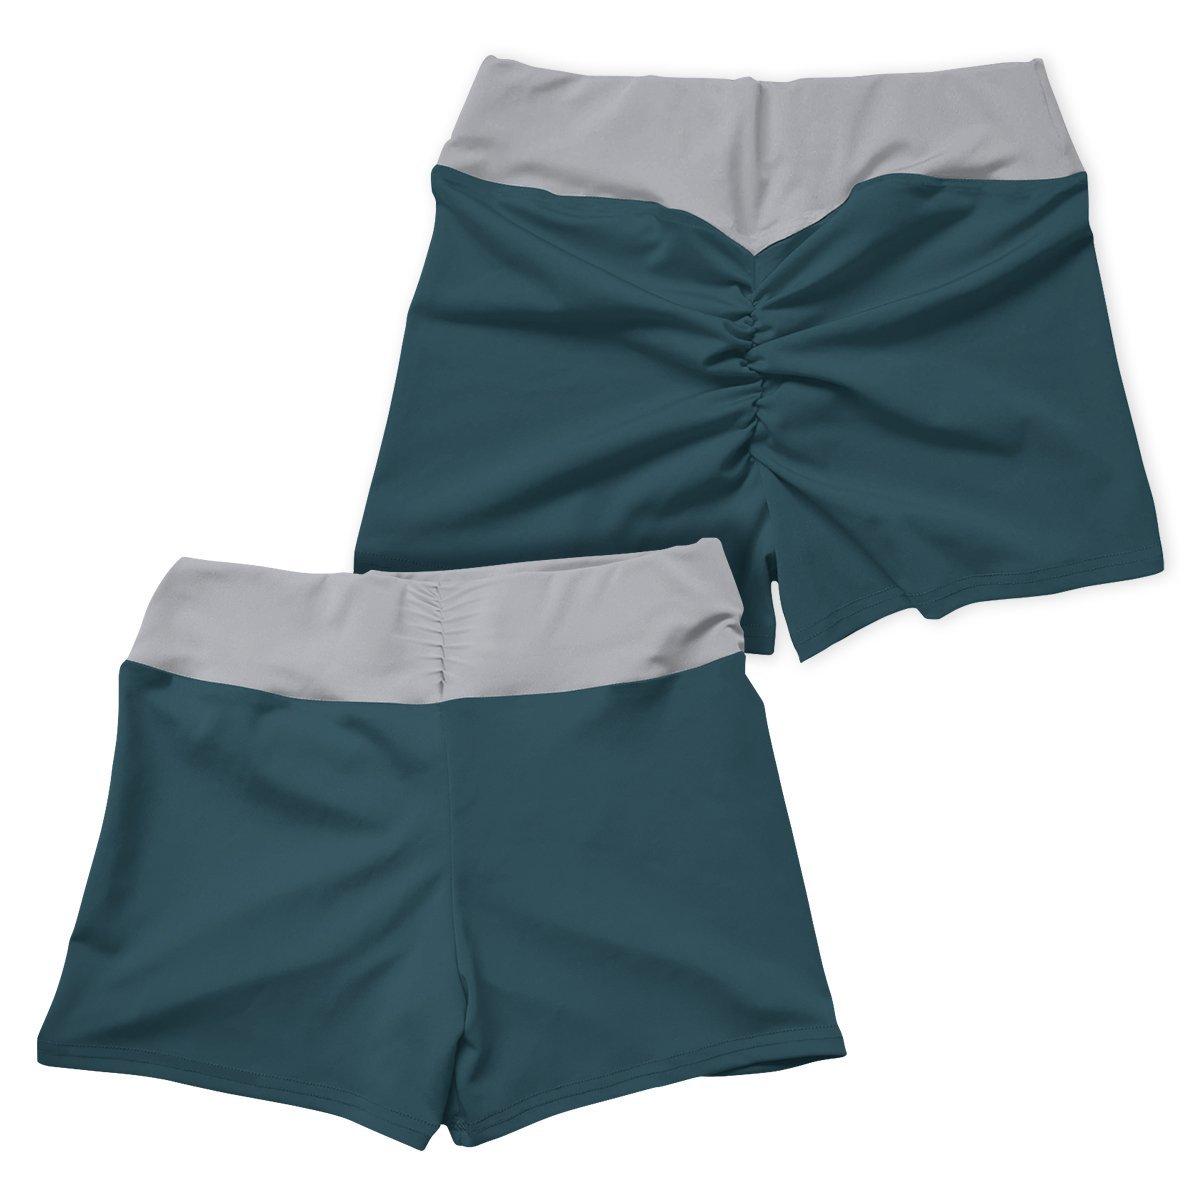 ua high uniform active wear set 689746 - Anime Swimsuits